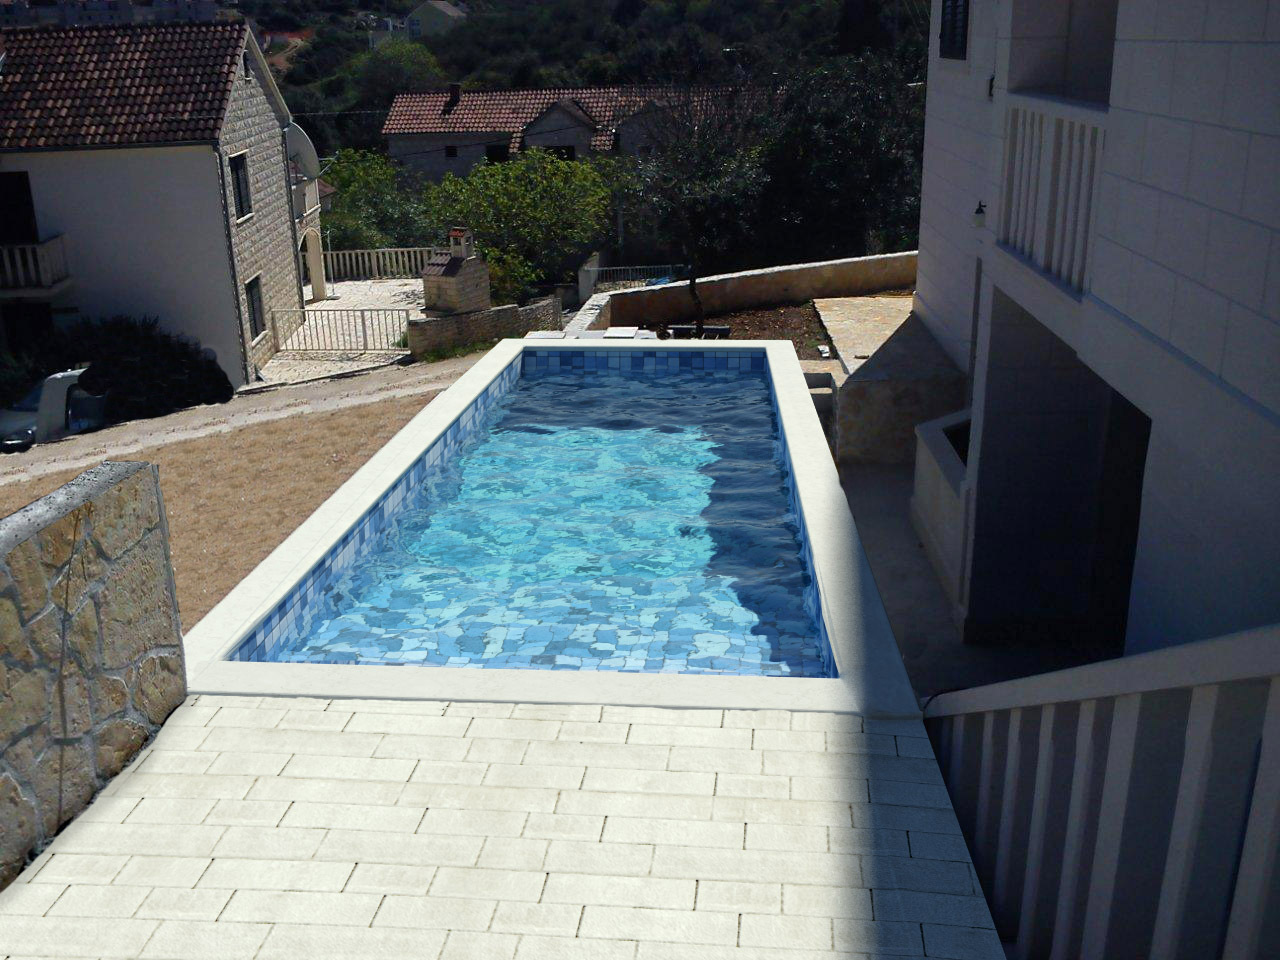 5464  - Sutivan - Maisons de repos, villas Croatie - piscine